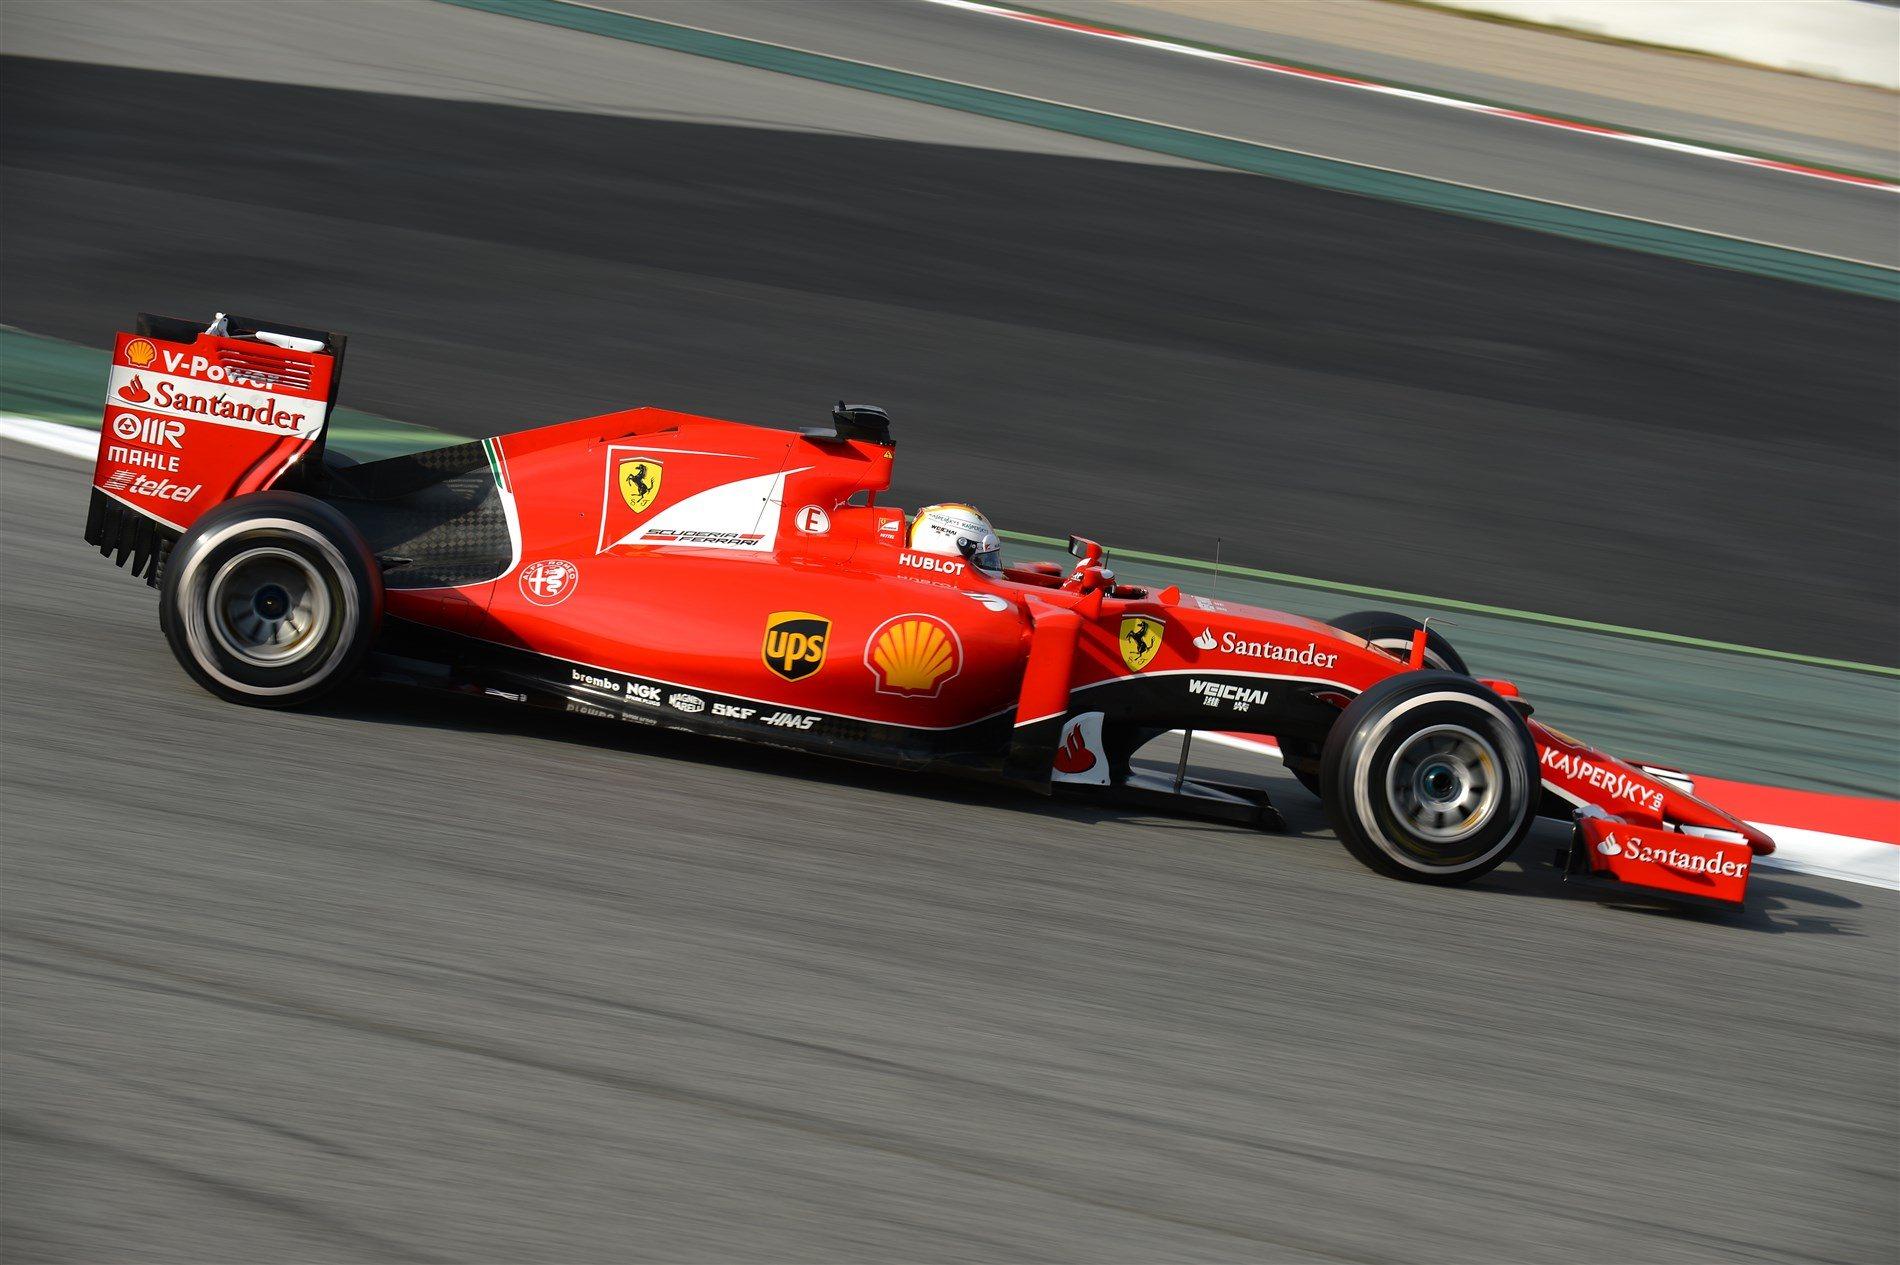 F1 2015 Preview Ferrari Sf15 T The Lowdown